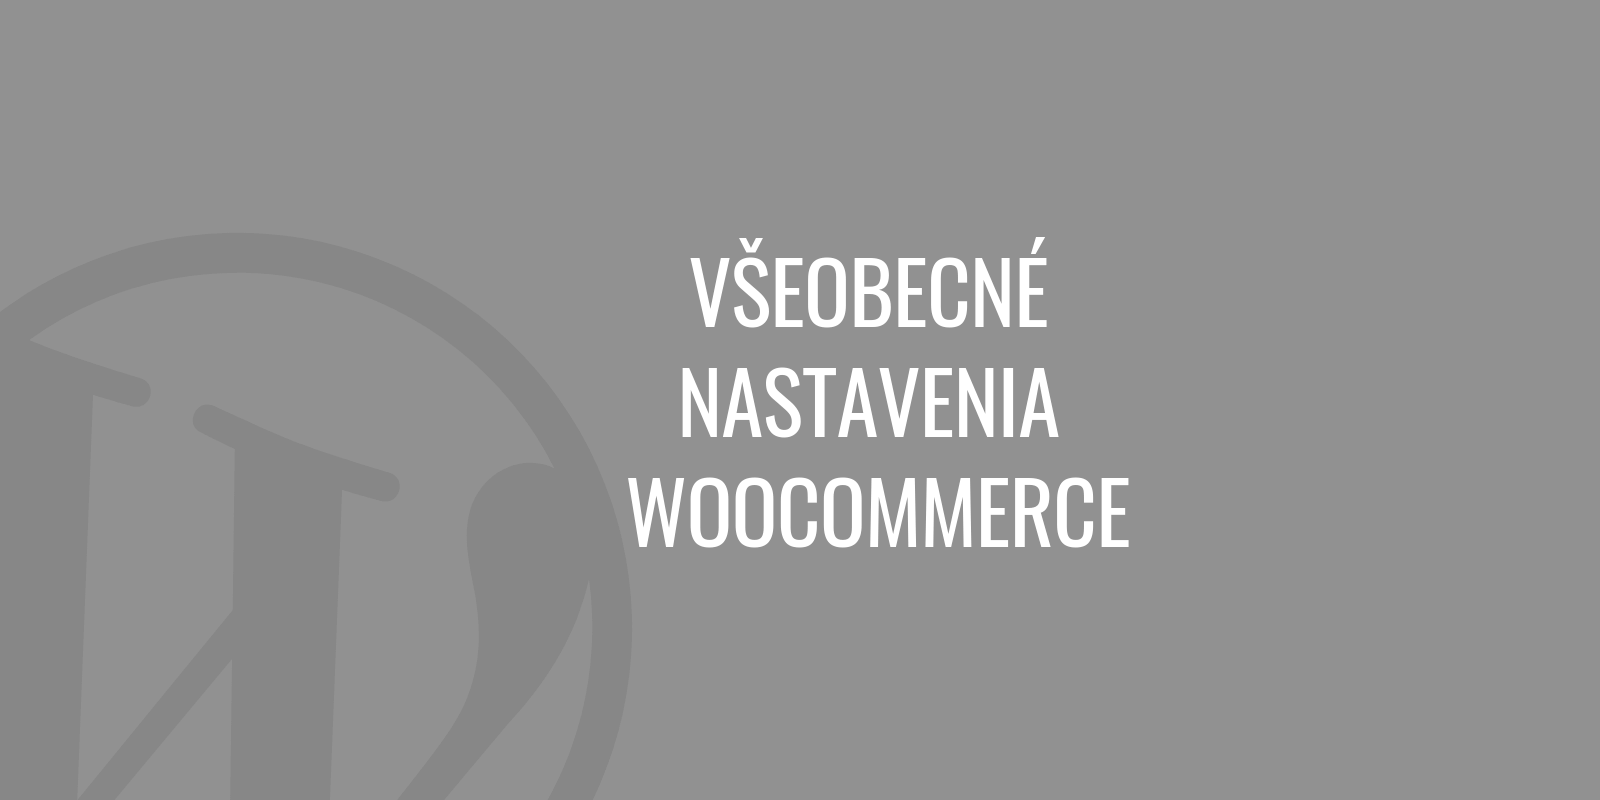 Všeobecné nastavenia WooCommerce